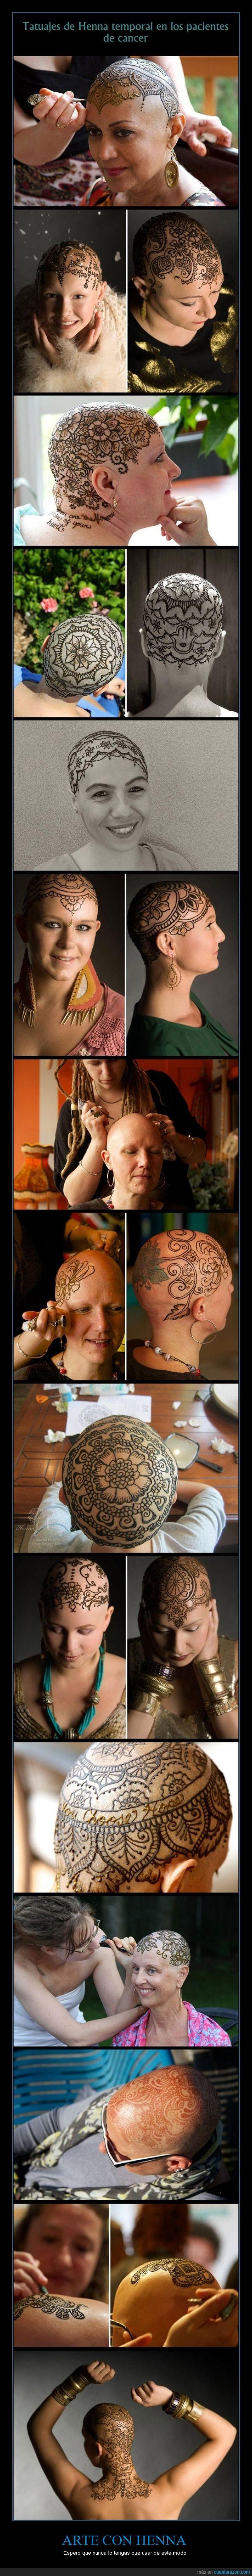 calvicie,cancer,henna,quimio,tatuaje,temporal